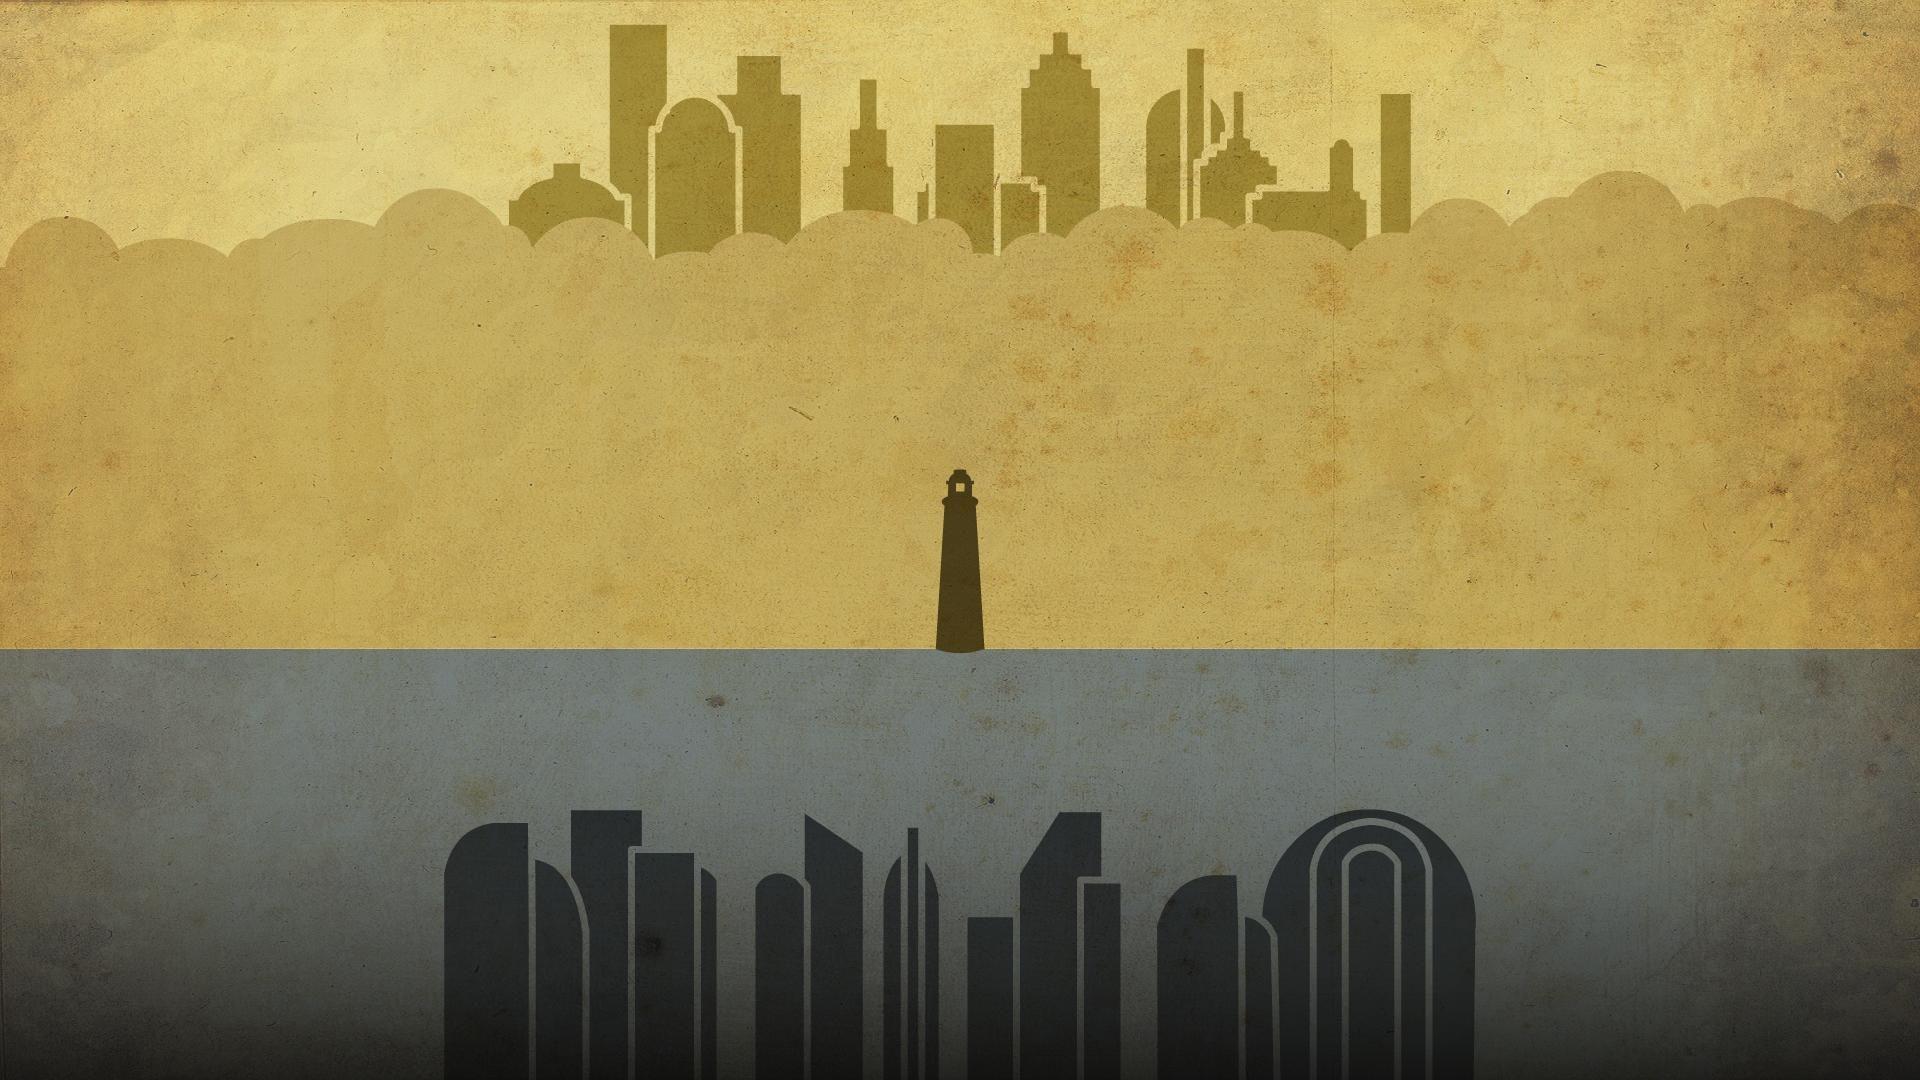 Bioshock Minimal HD Wallpaper - GamePhD